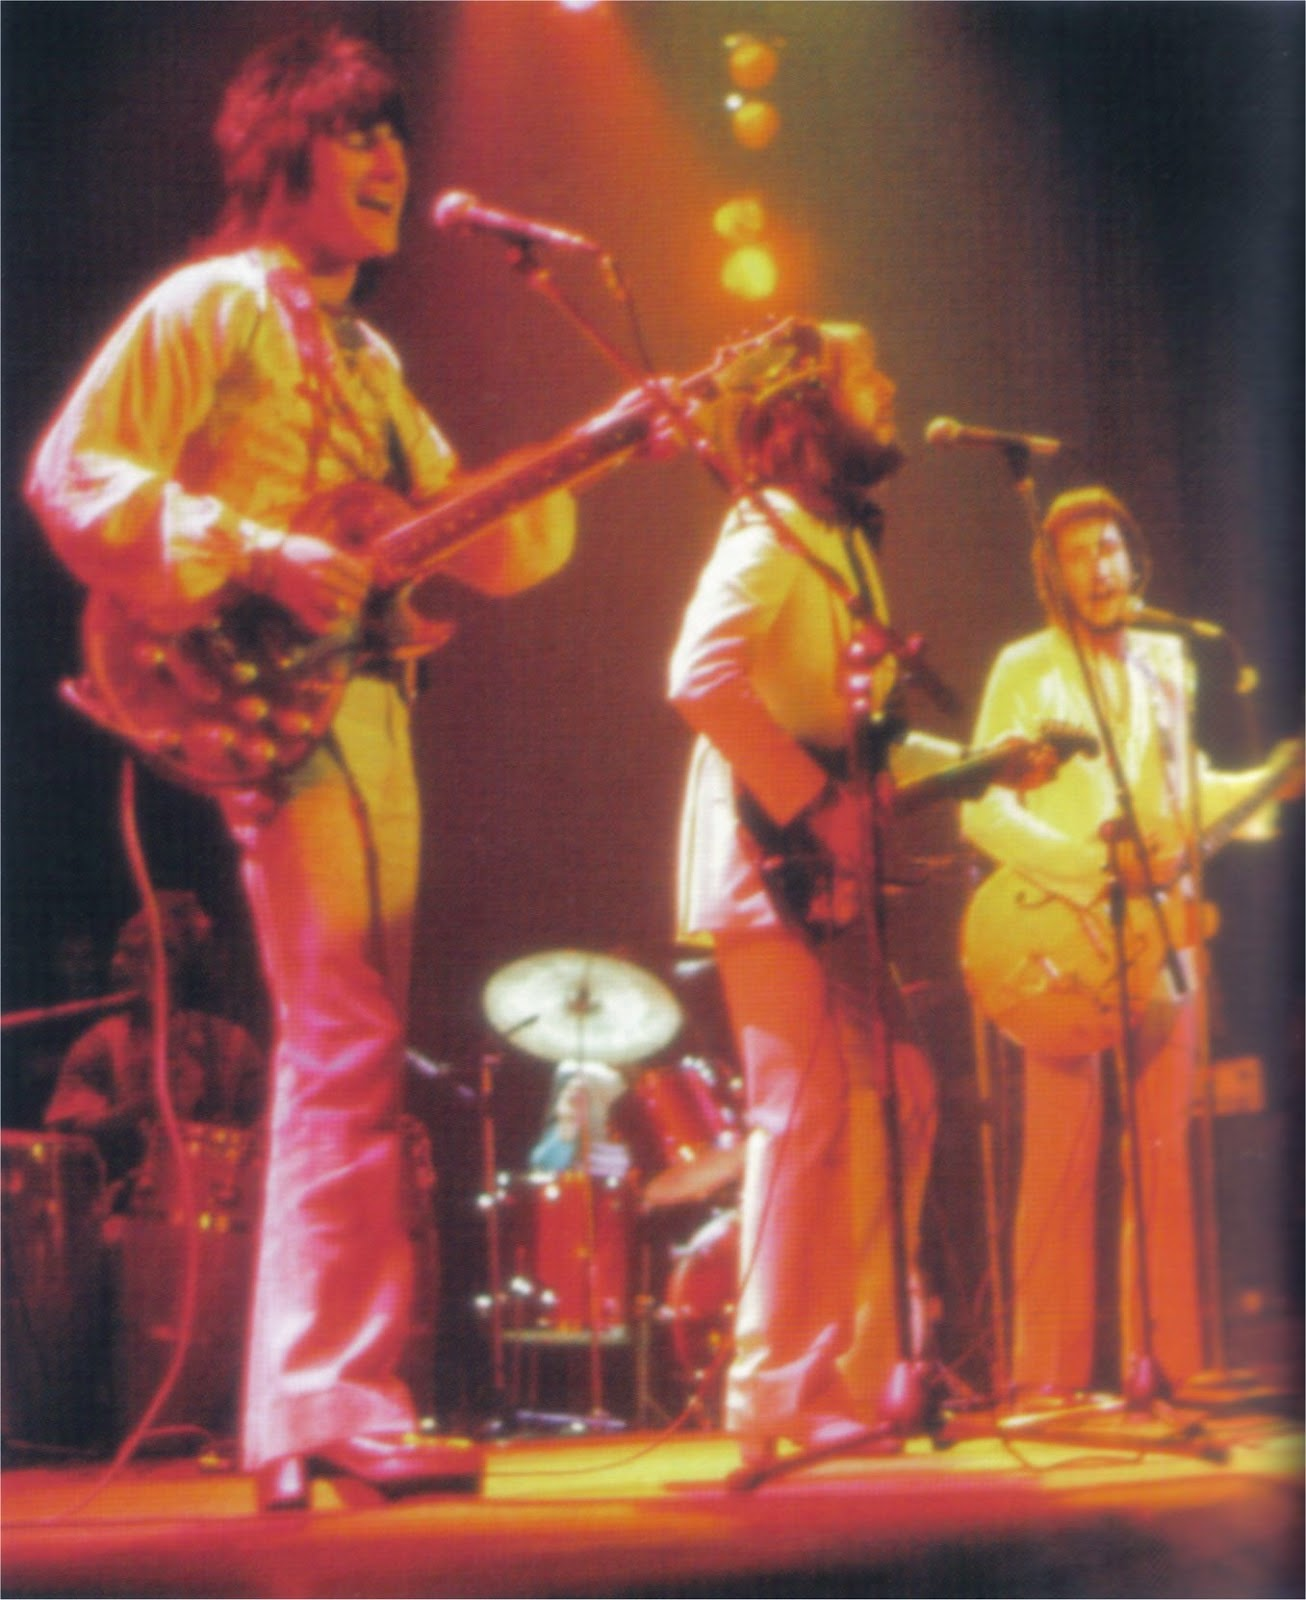 Wood, Clapton & Townsend - Rainbow Concert